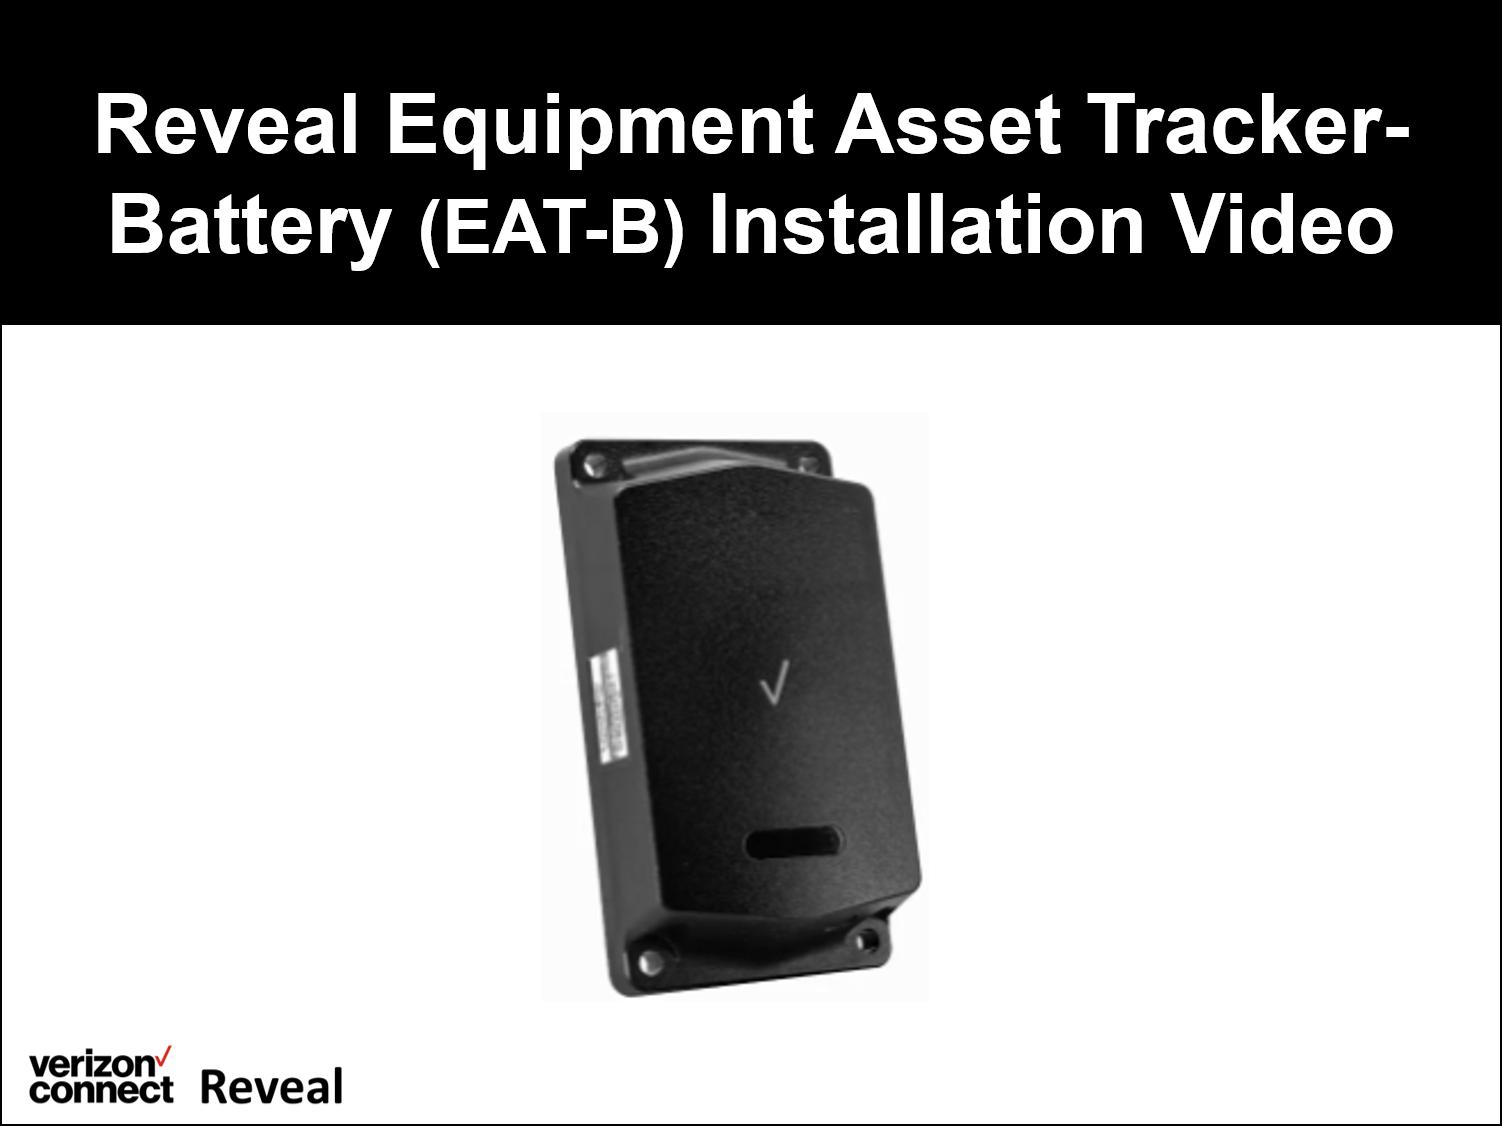 Reveal Equipment Asset Tracker-Battery (EAT-B) Installation Video